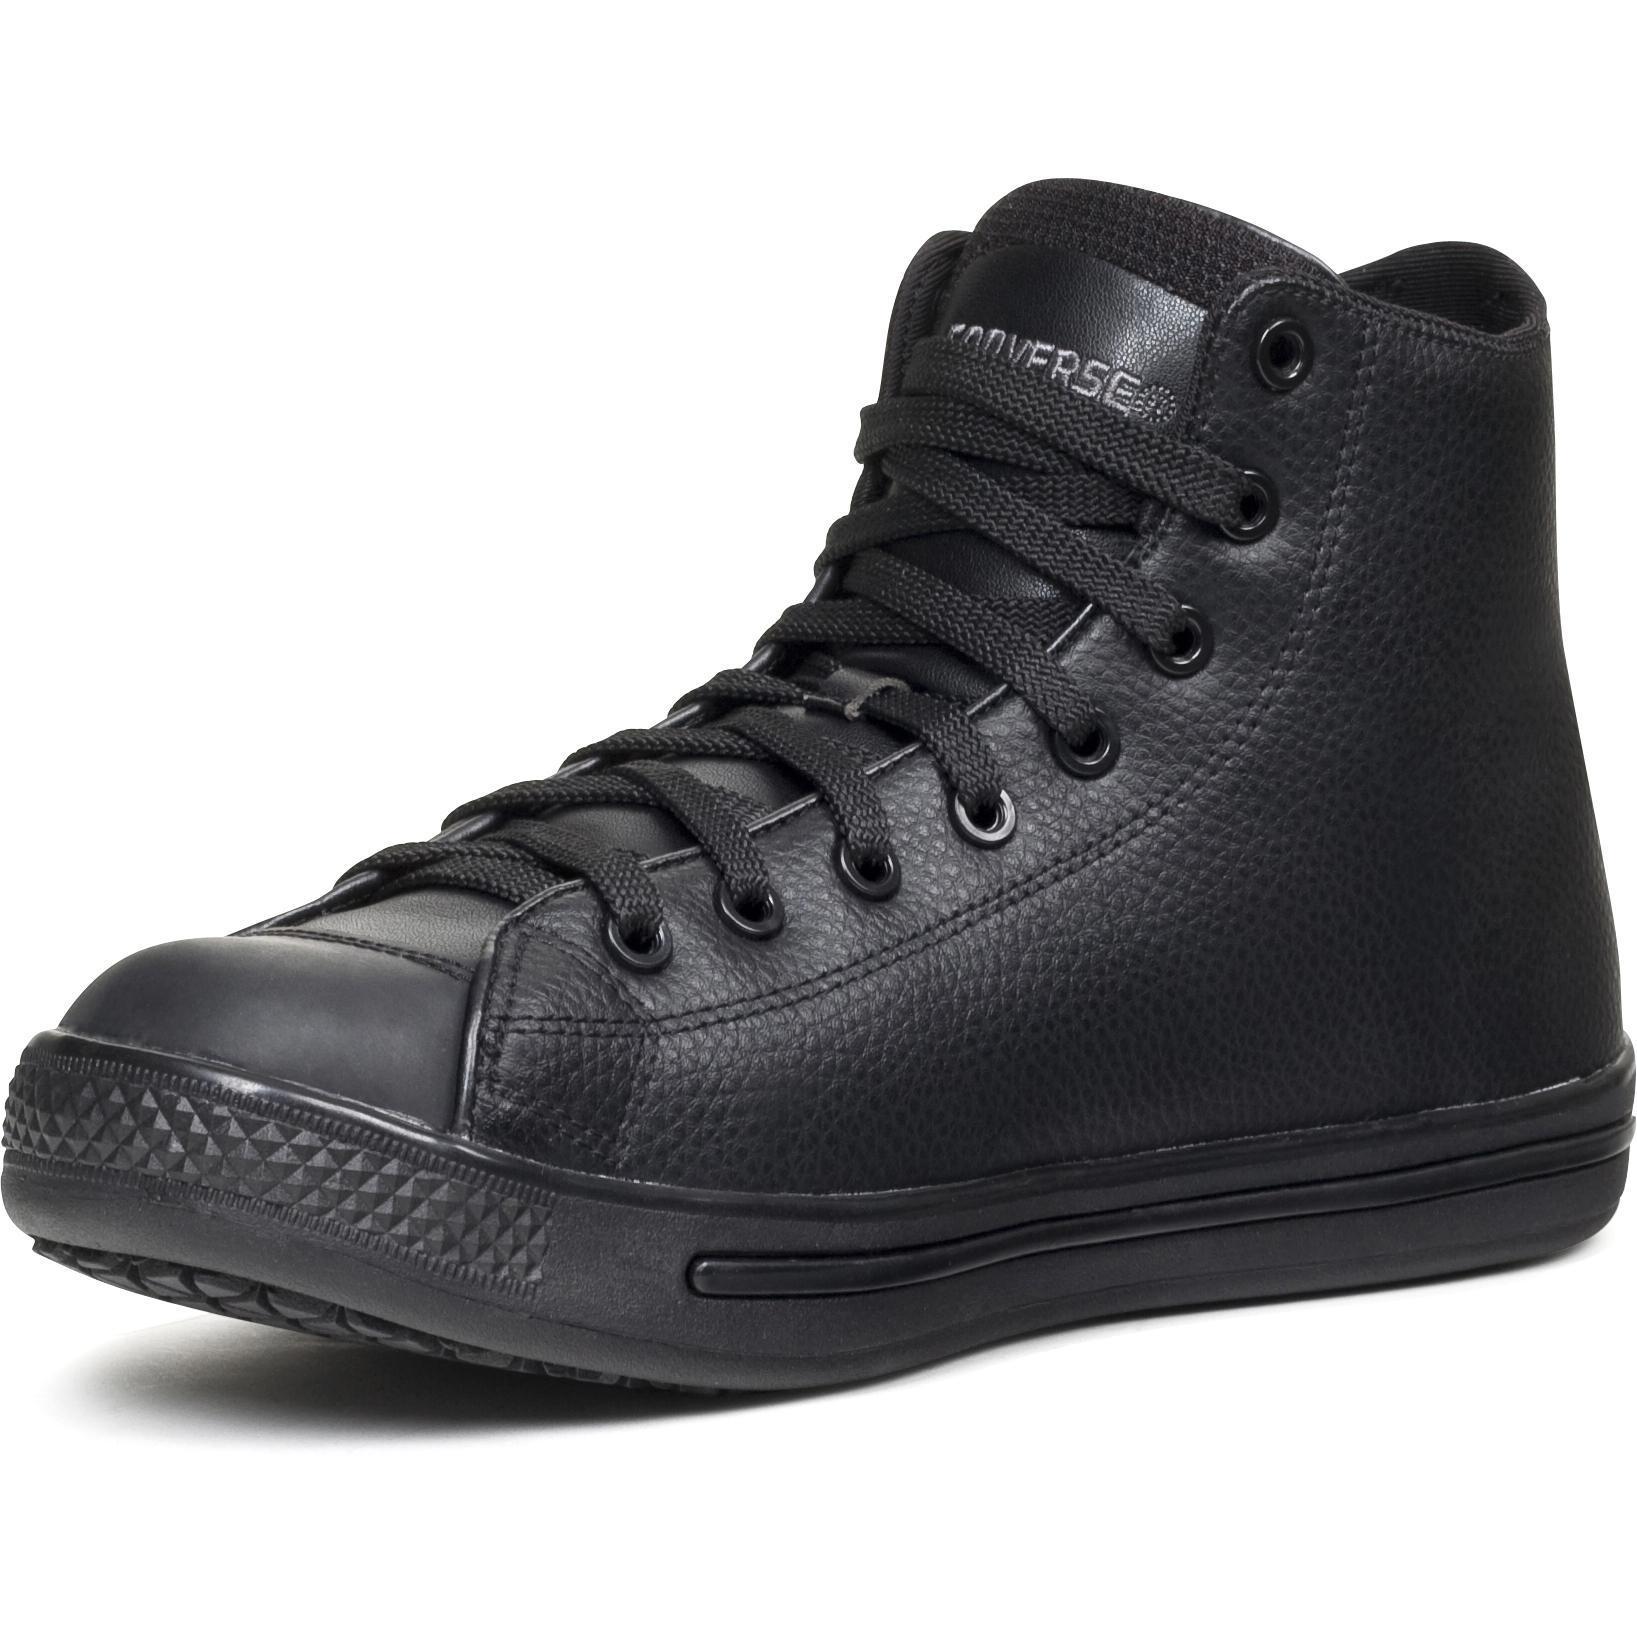 Slip Proof Shoes Walmart